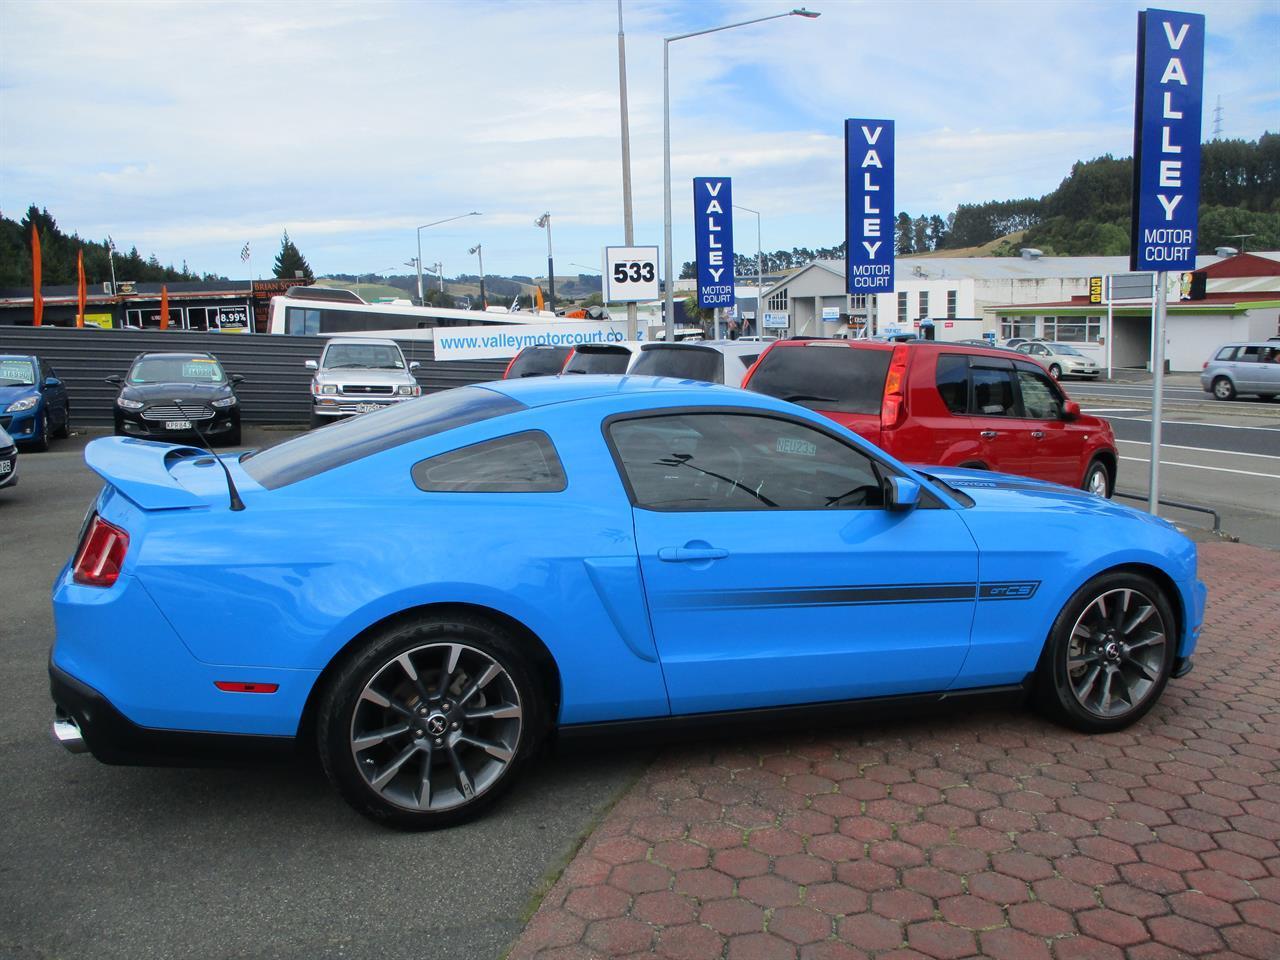 image-2, 2012 Ford Mustang GT/CS at Dunedin